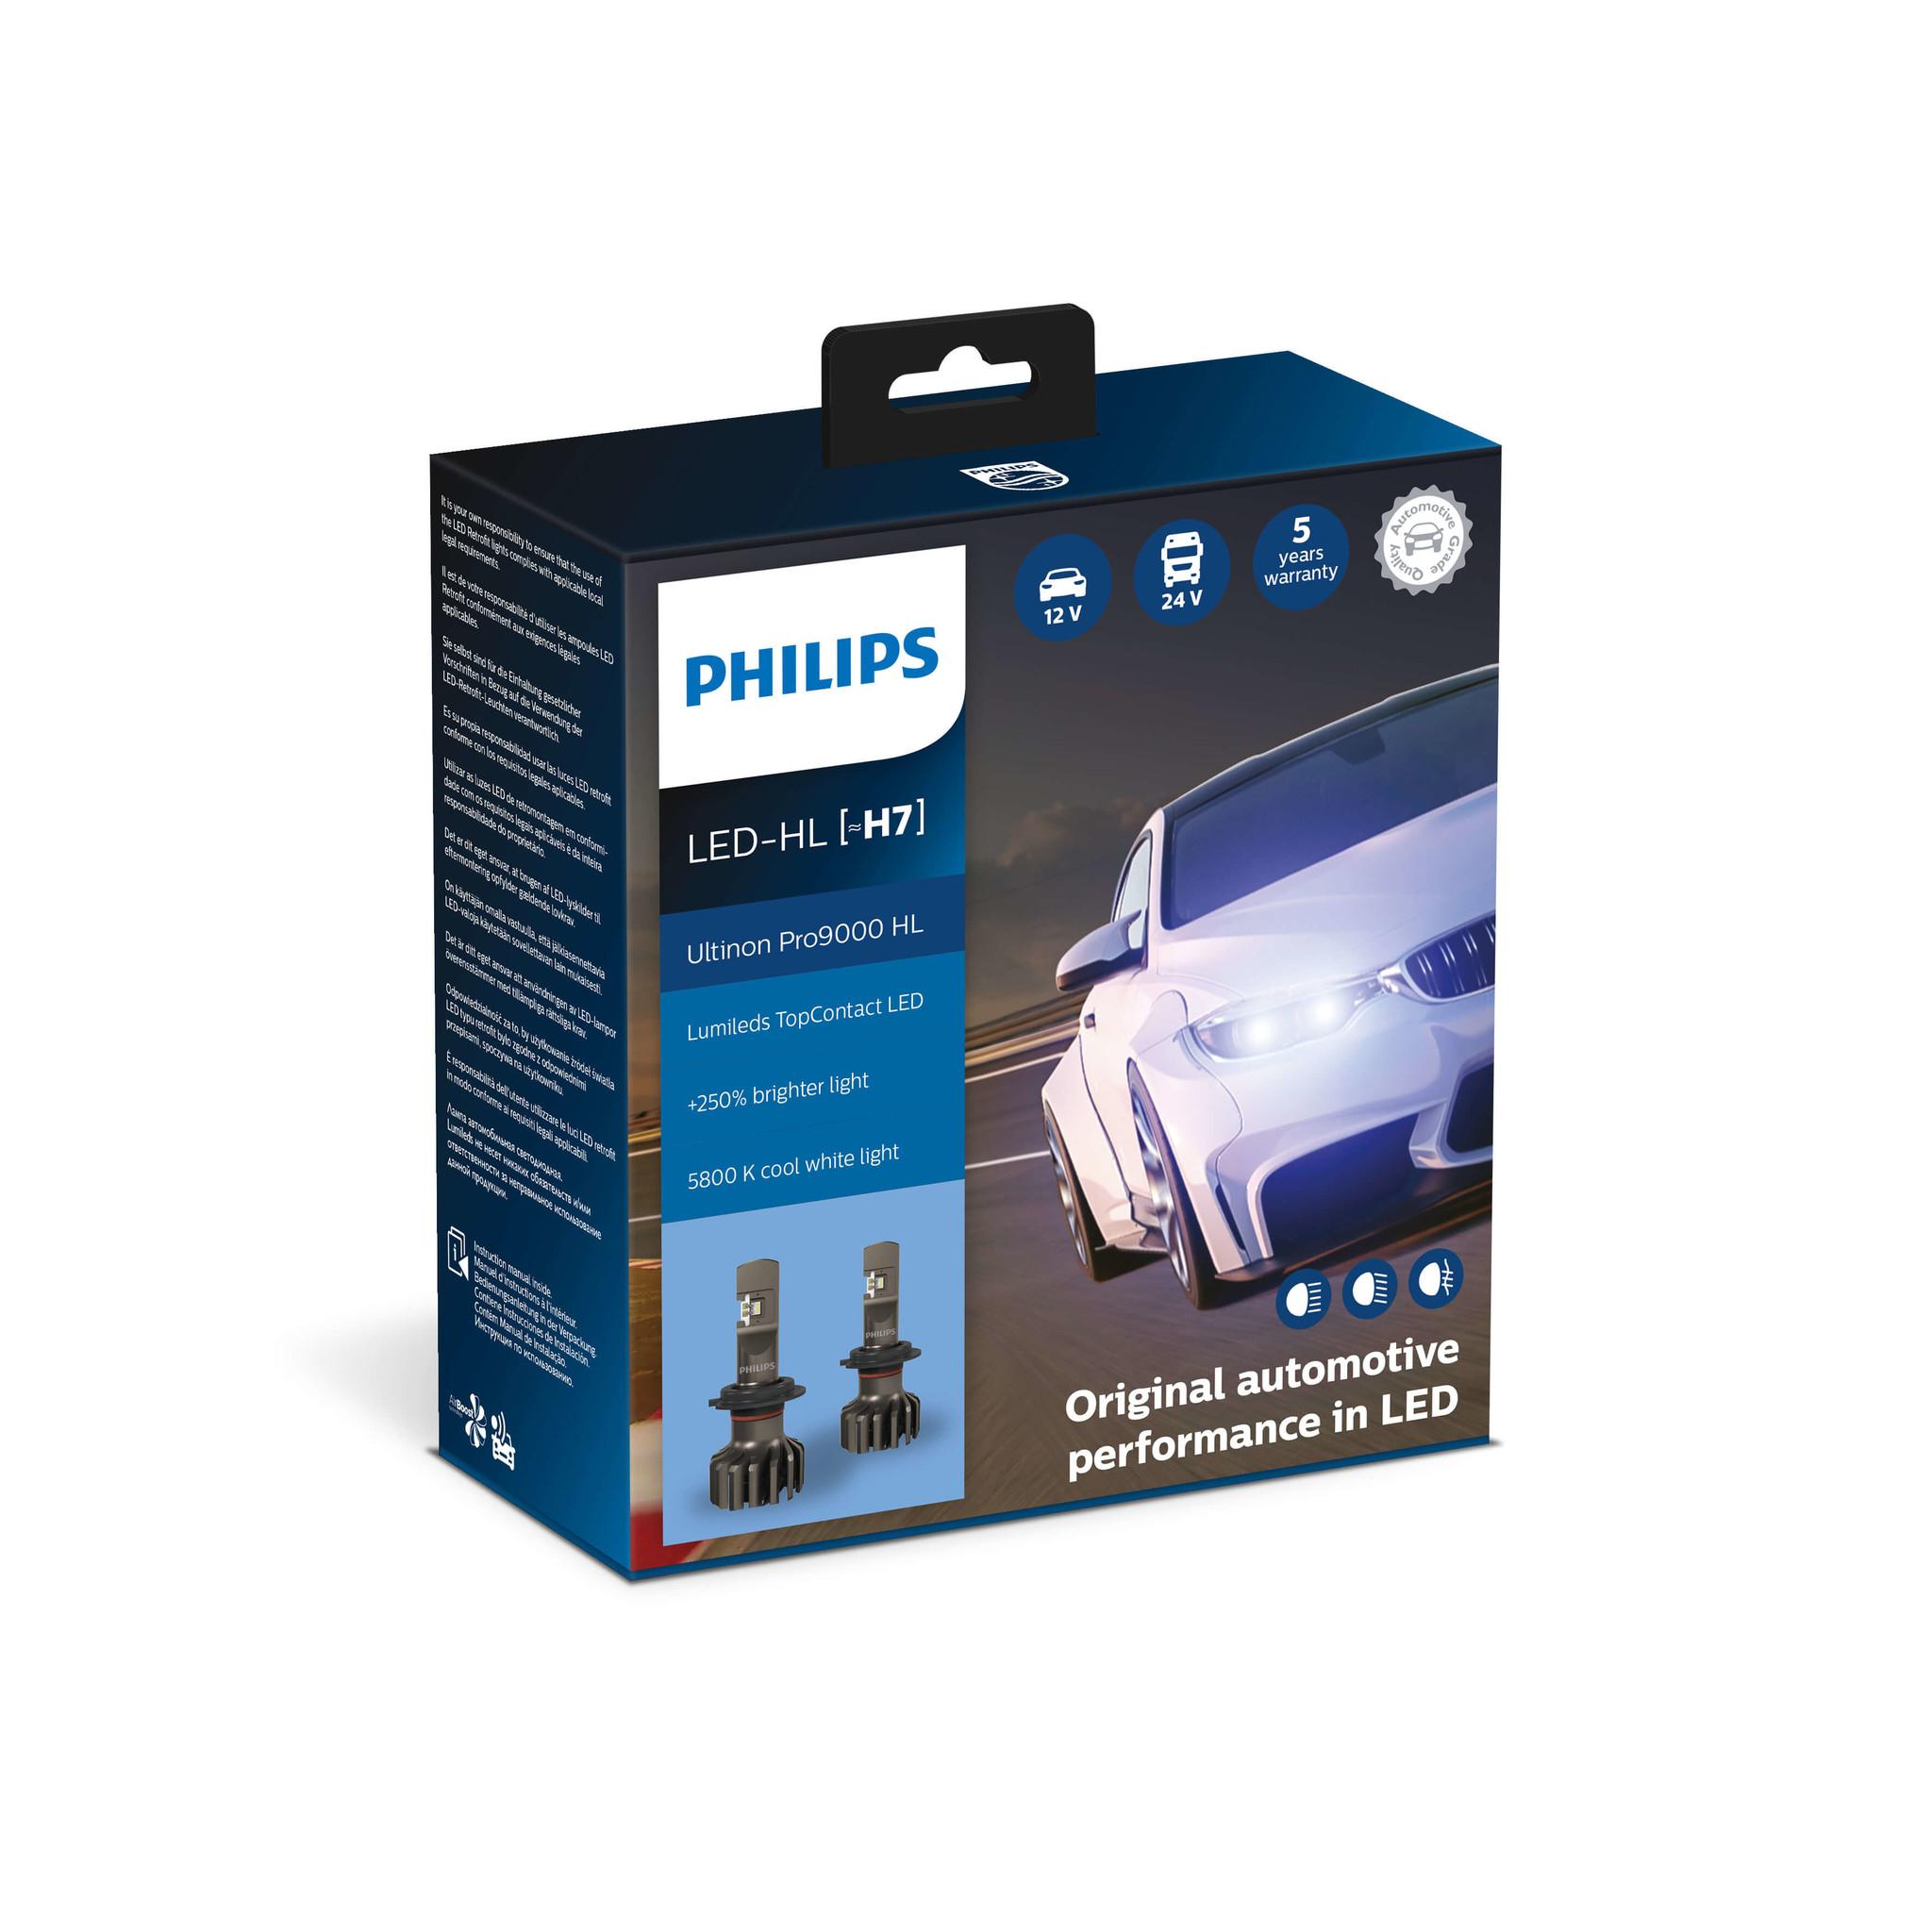 Philips LED H7 Ultinon Pro9000 HL